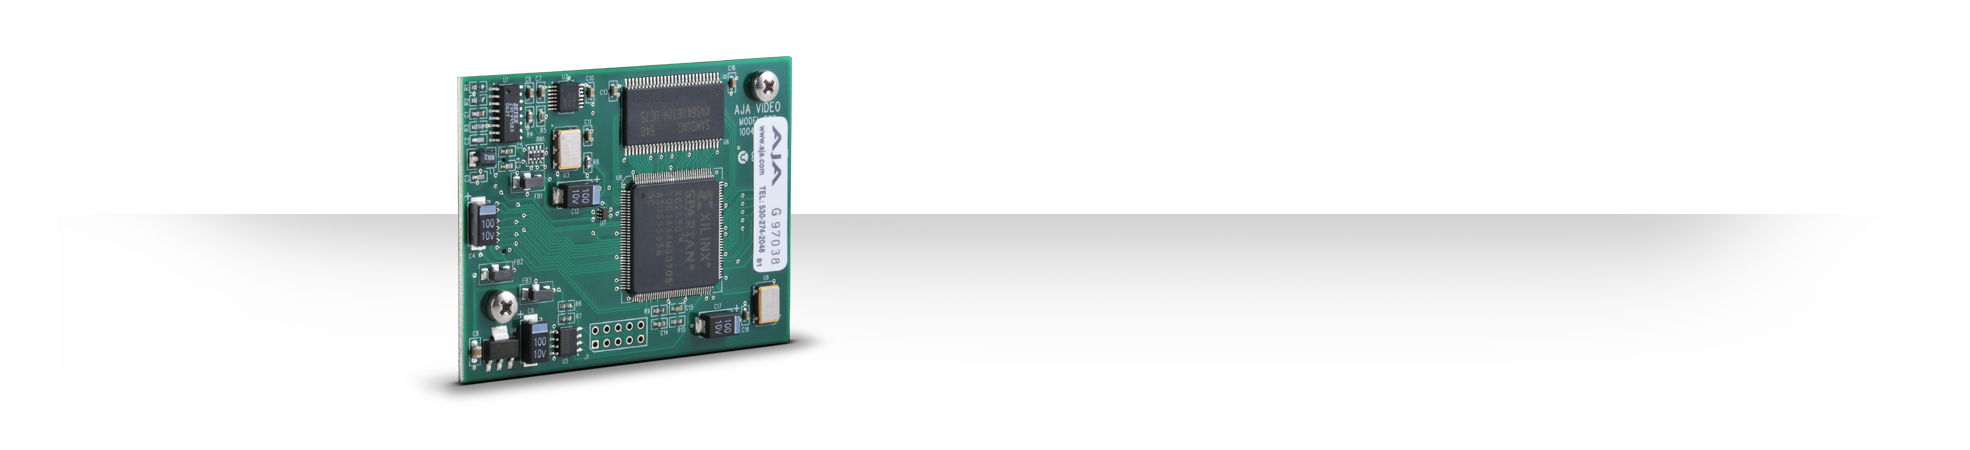 FSG - Frame Sync/Genlock Module - Rackframes - Products - AJA Video ...